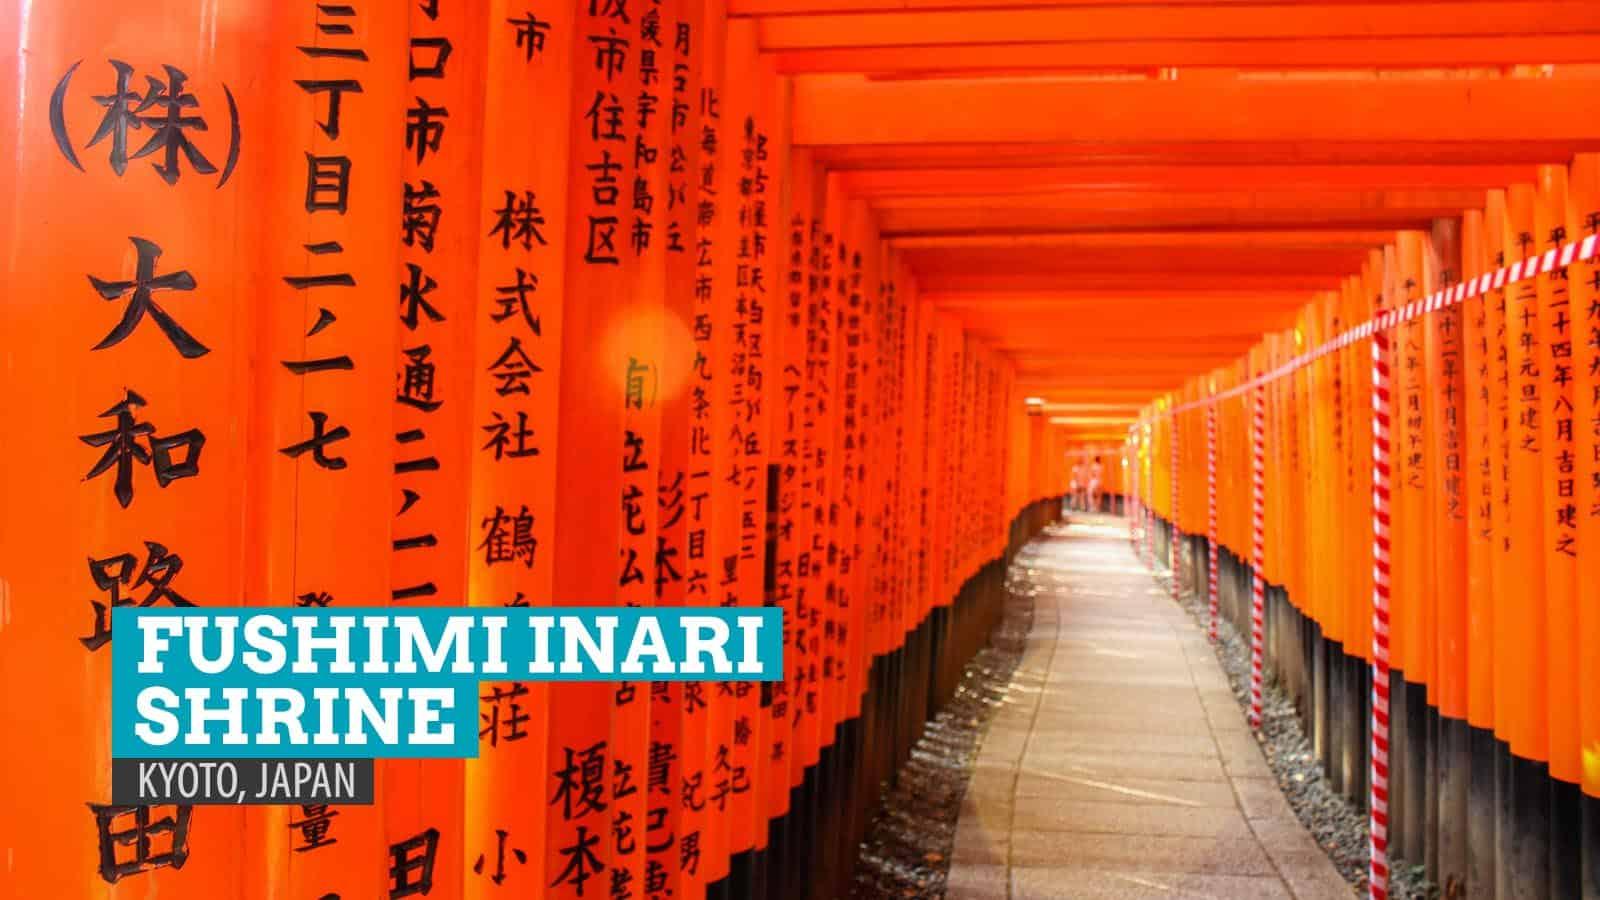 FUSHIMI INARI SHRINE: The Thousand Torii Gates of Kyoto, Japan